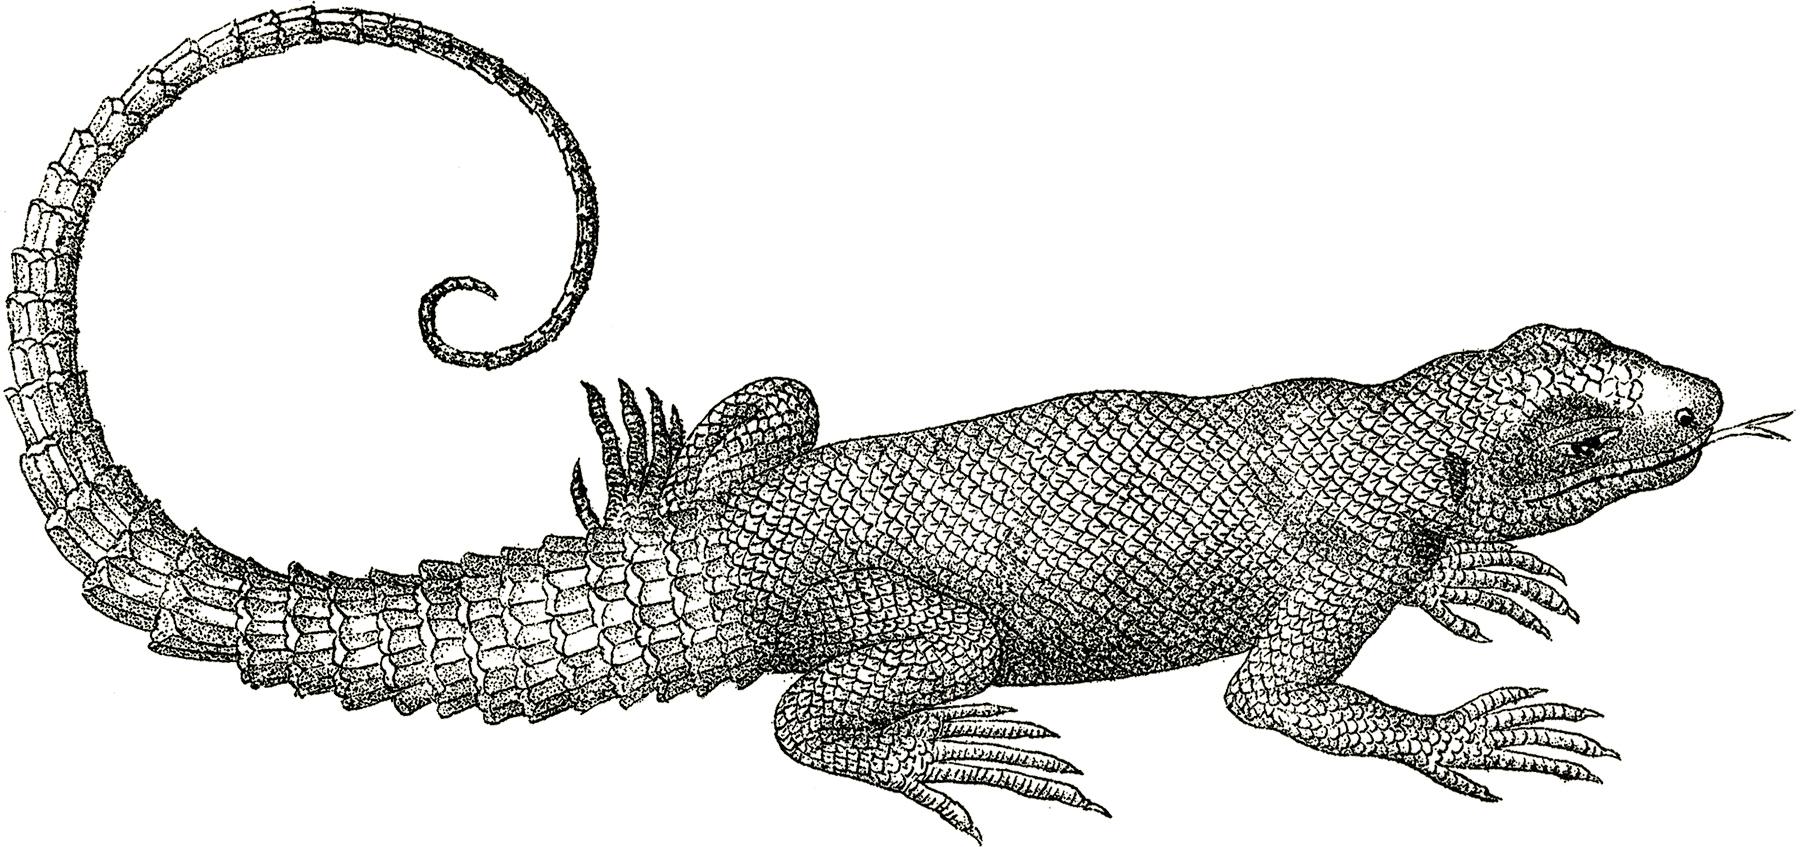 Free vintage lizard clip art the graphics fairy